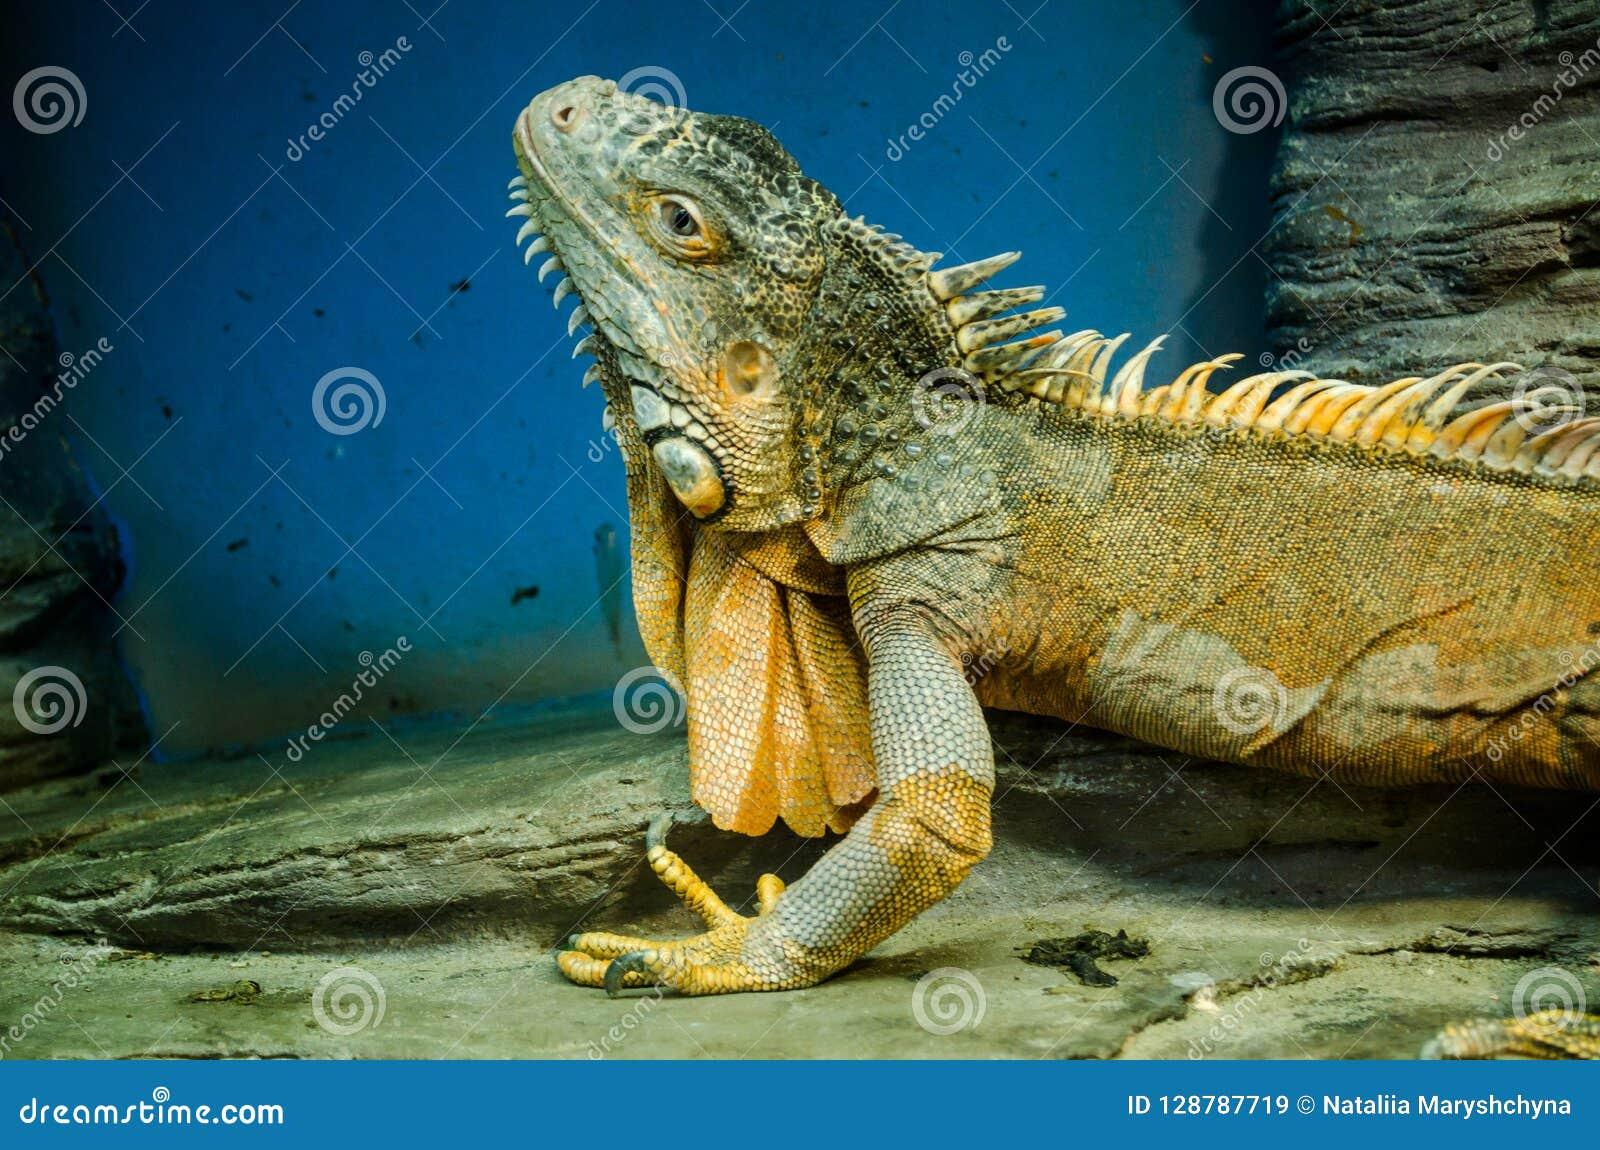 Green big Iguana with a sharp ridge in the Kiev zoo